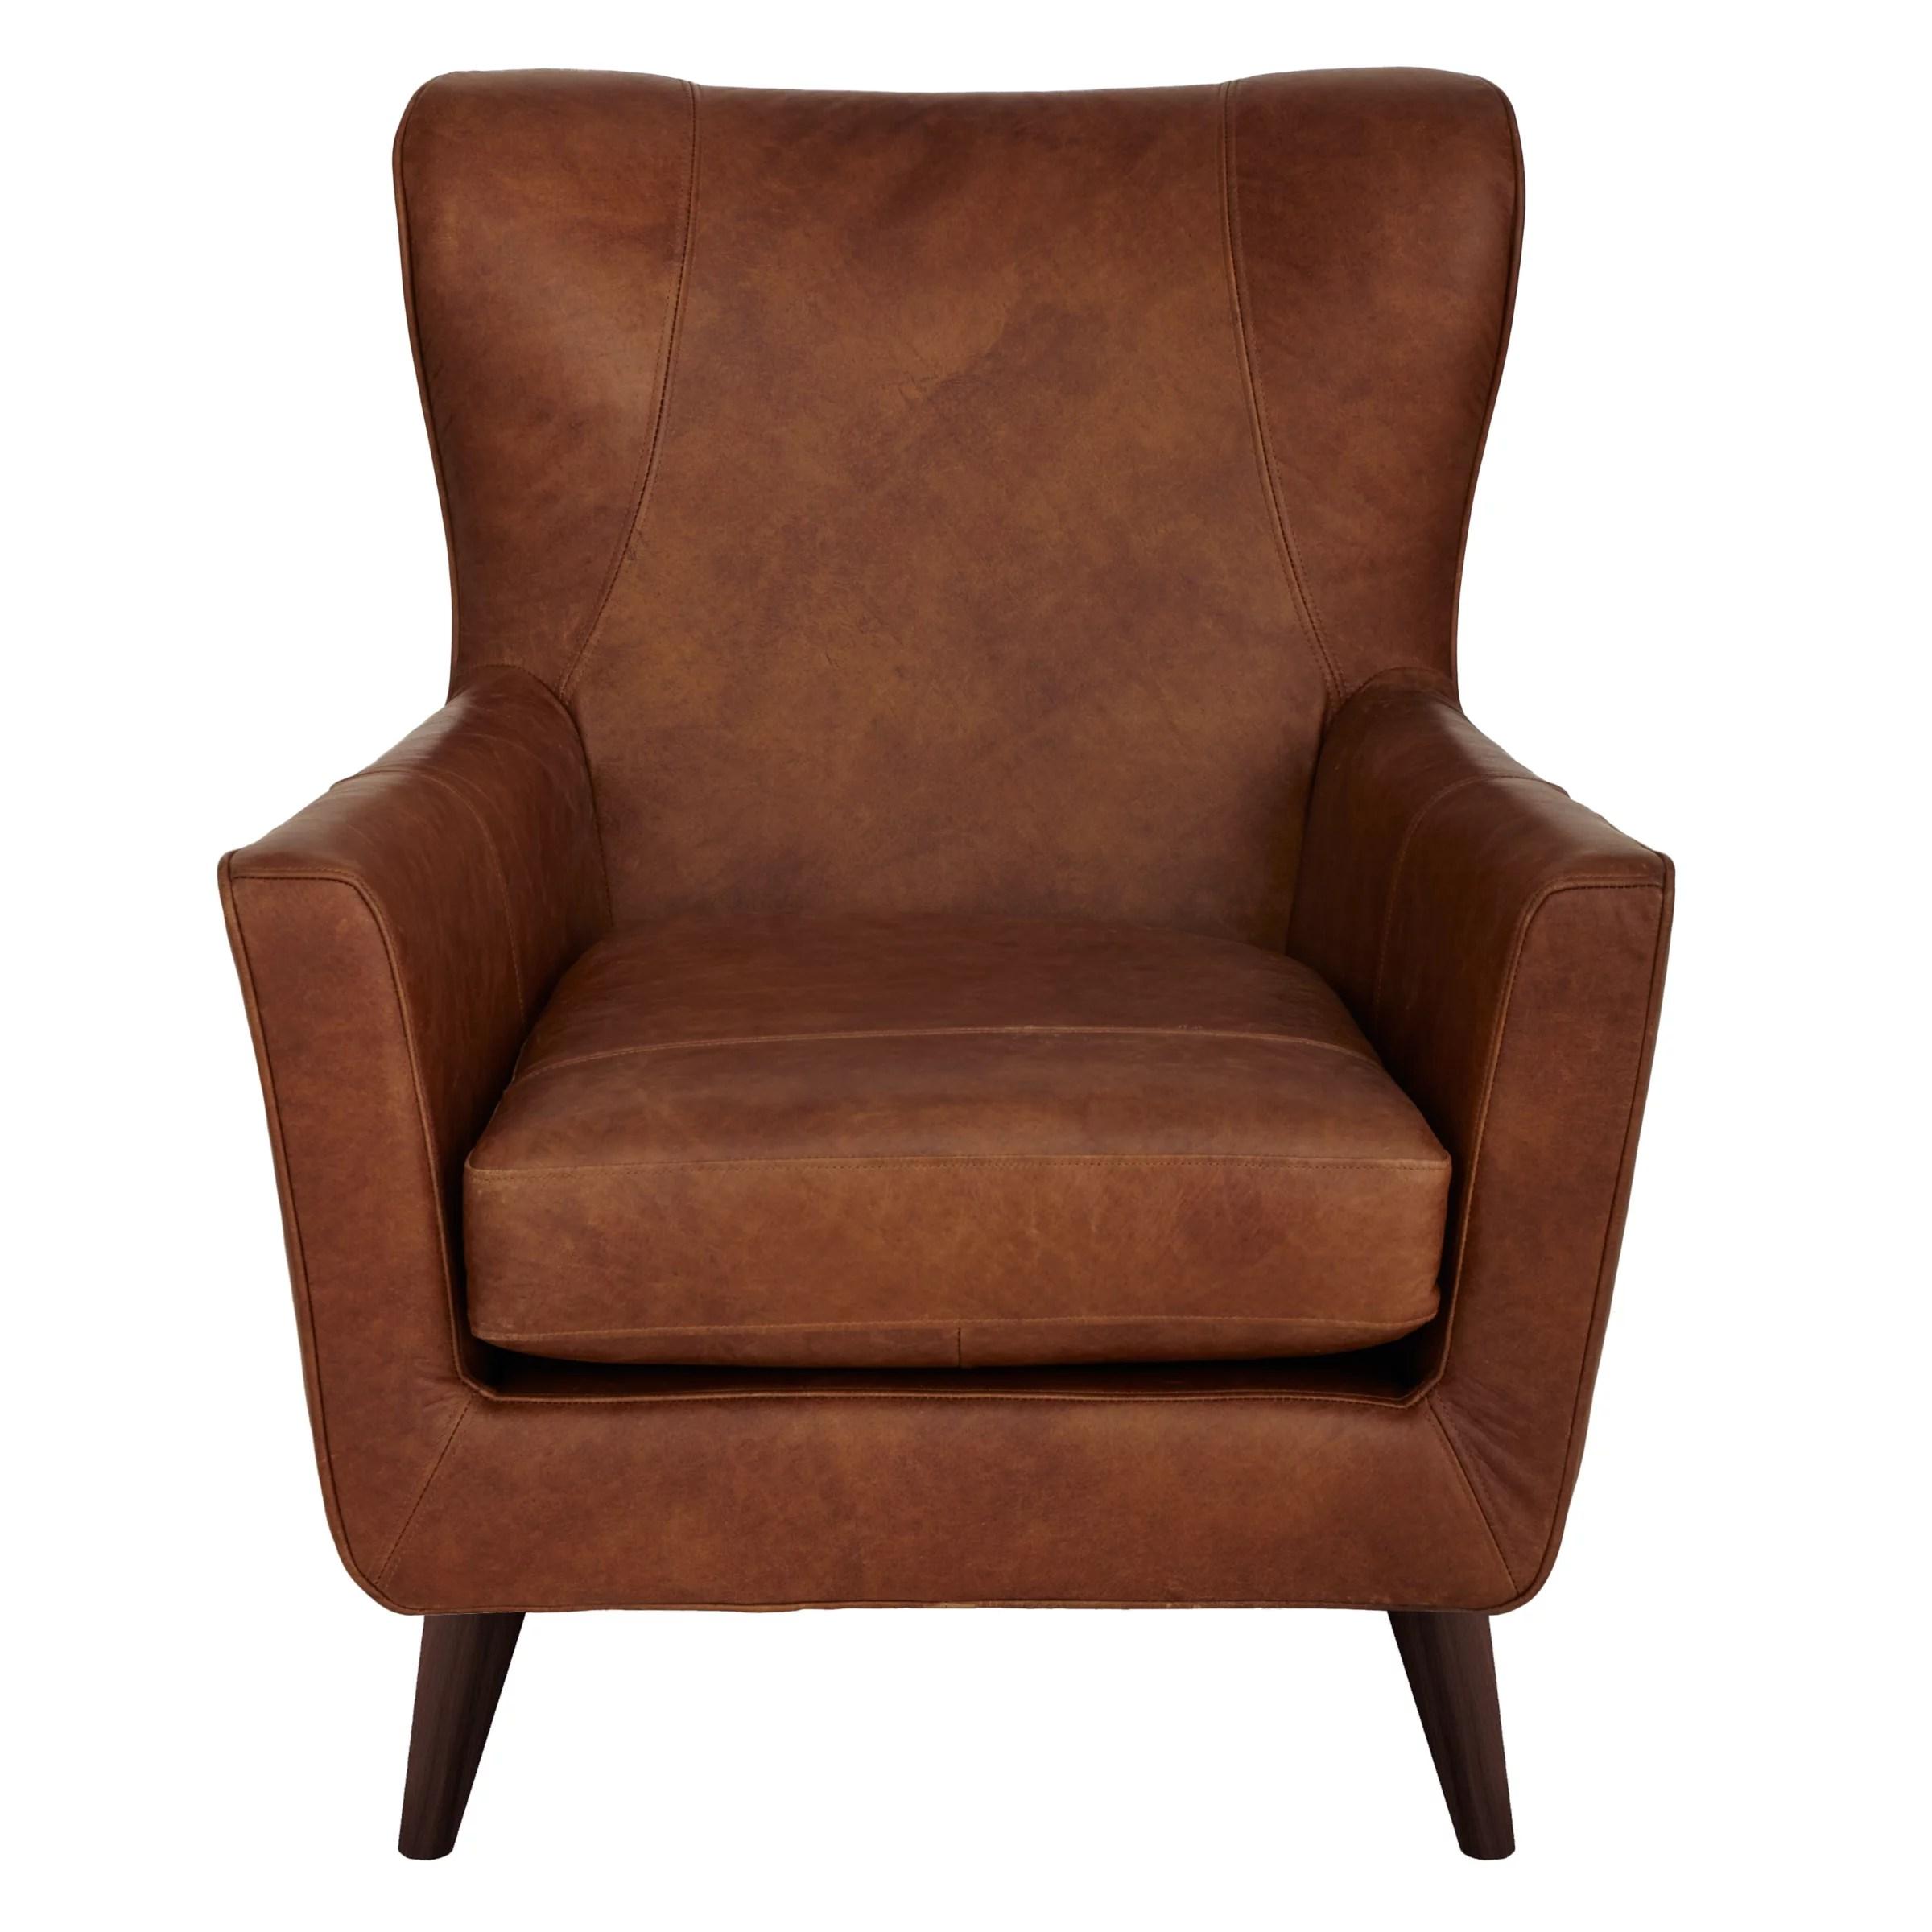 John Lewis Thomas Leather Armchair, Lustre Cappuccino